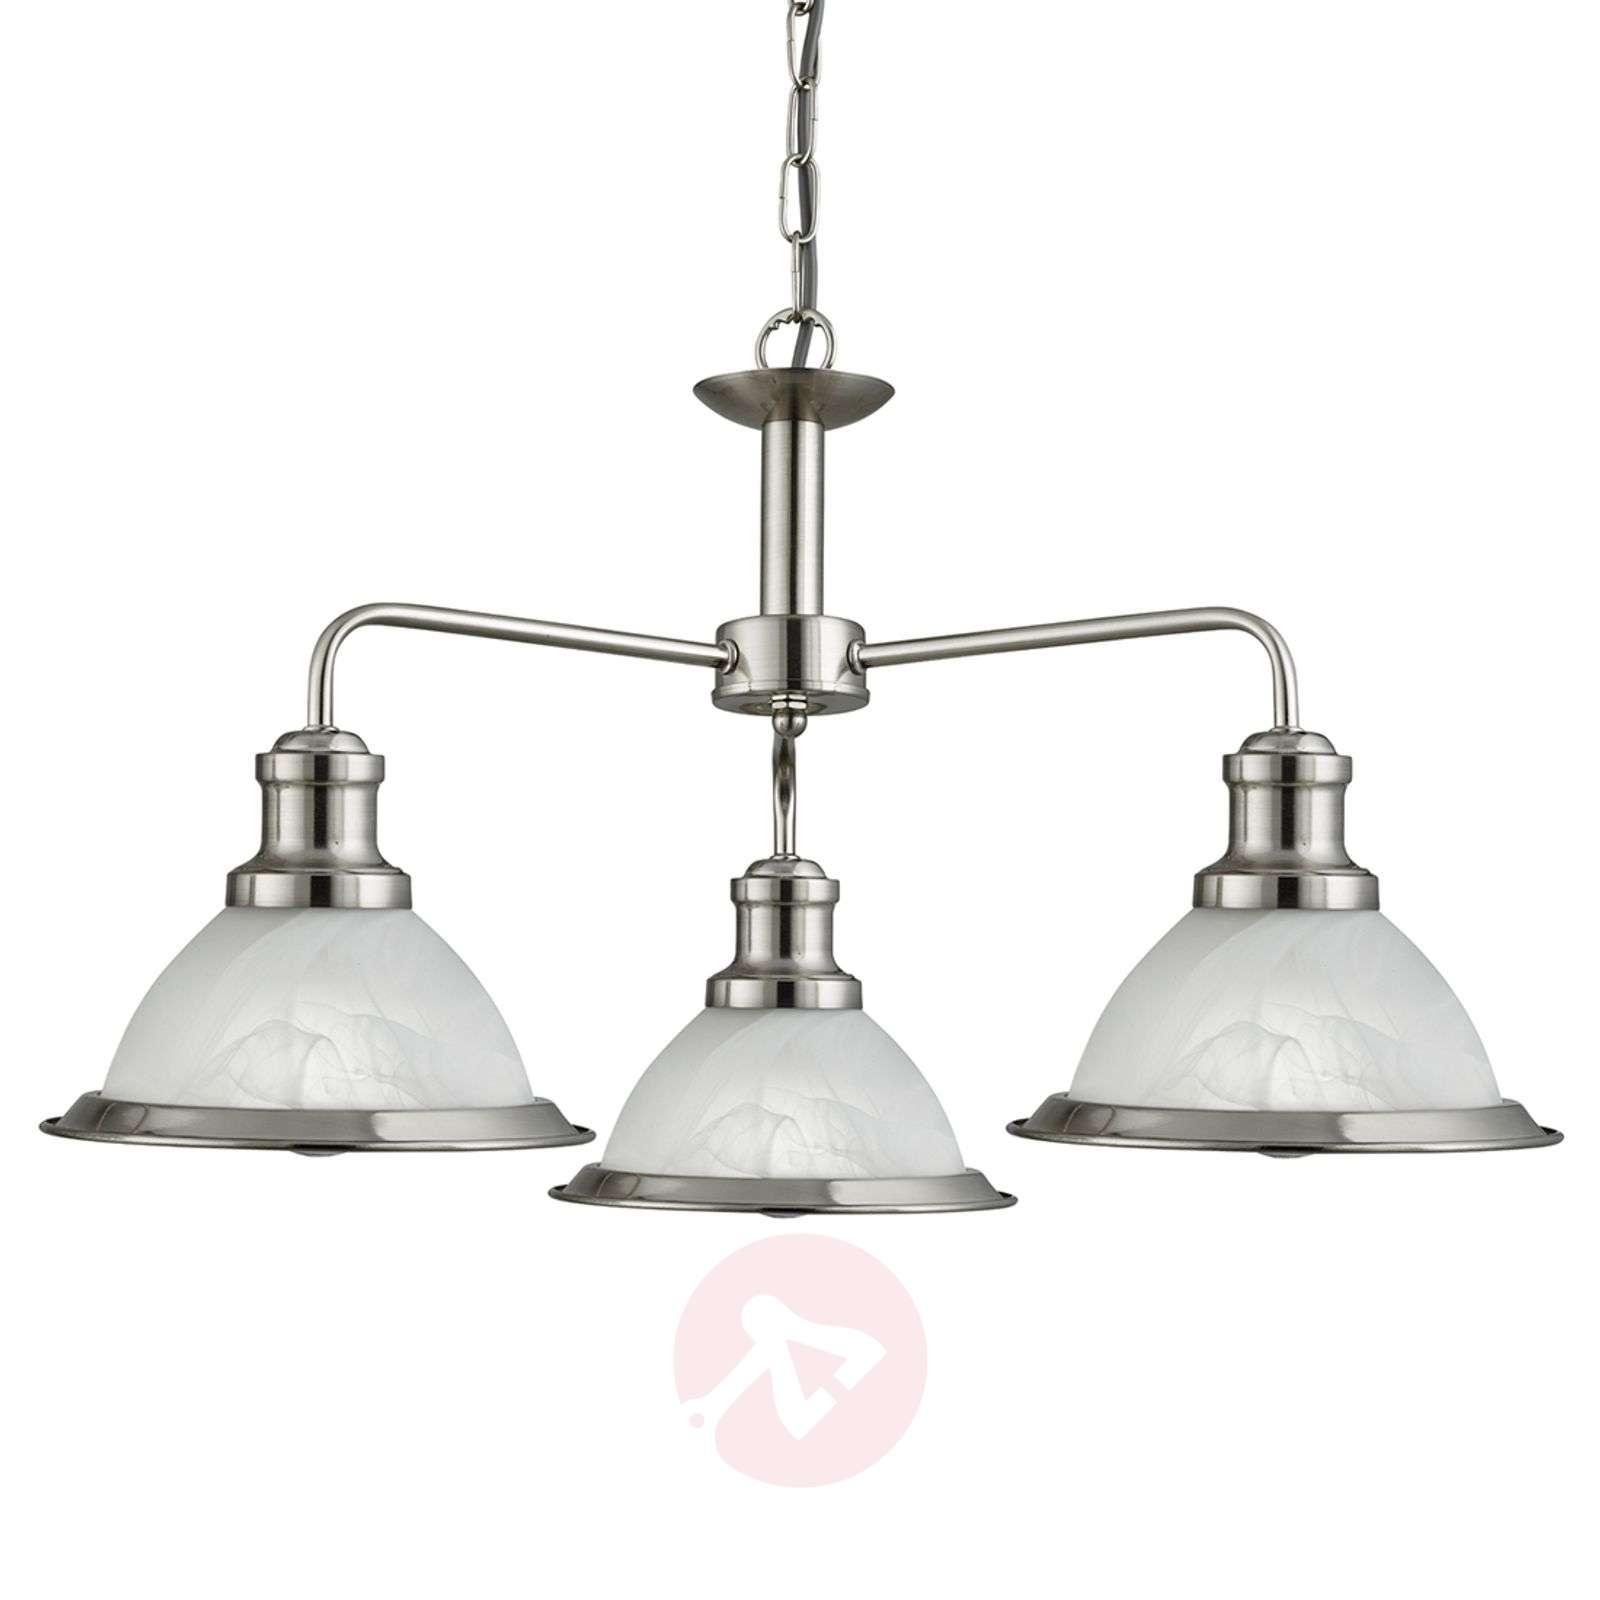 Retro-style 3-bulb Bistro hanging light-8570914-01